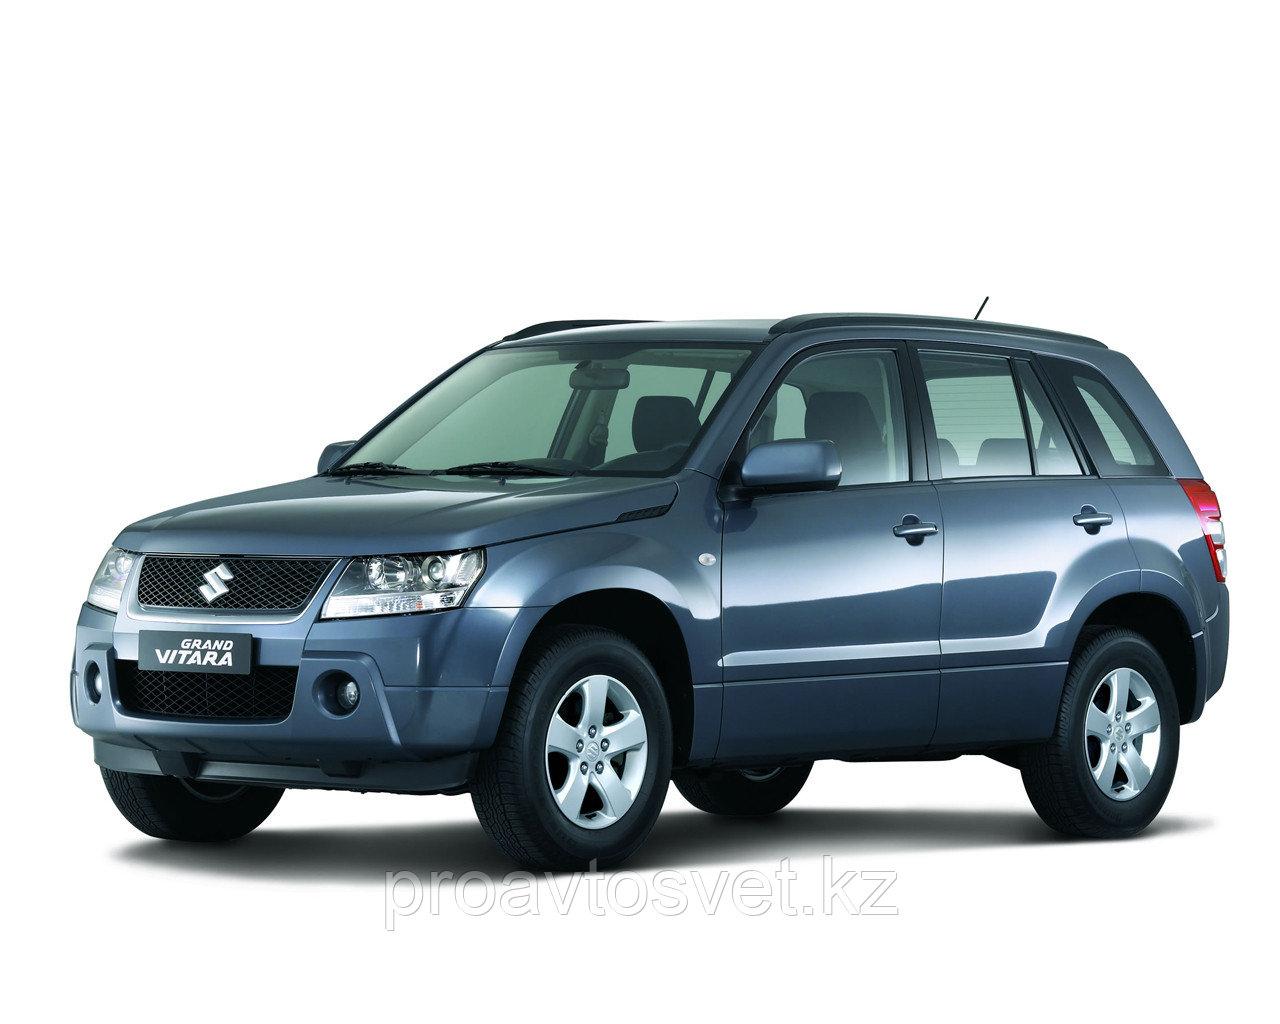 Переходные рамки на Suzuki Grand Vitara III дорестайл и рестайл (2005-2016)